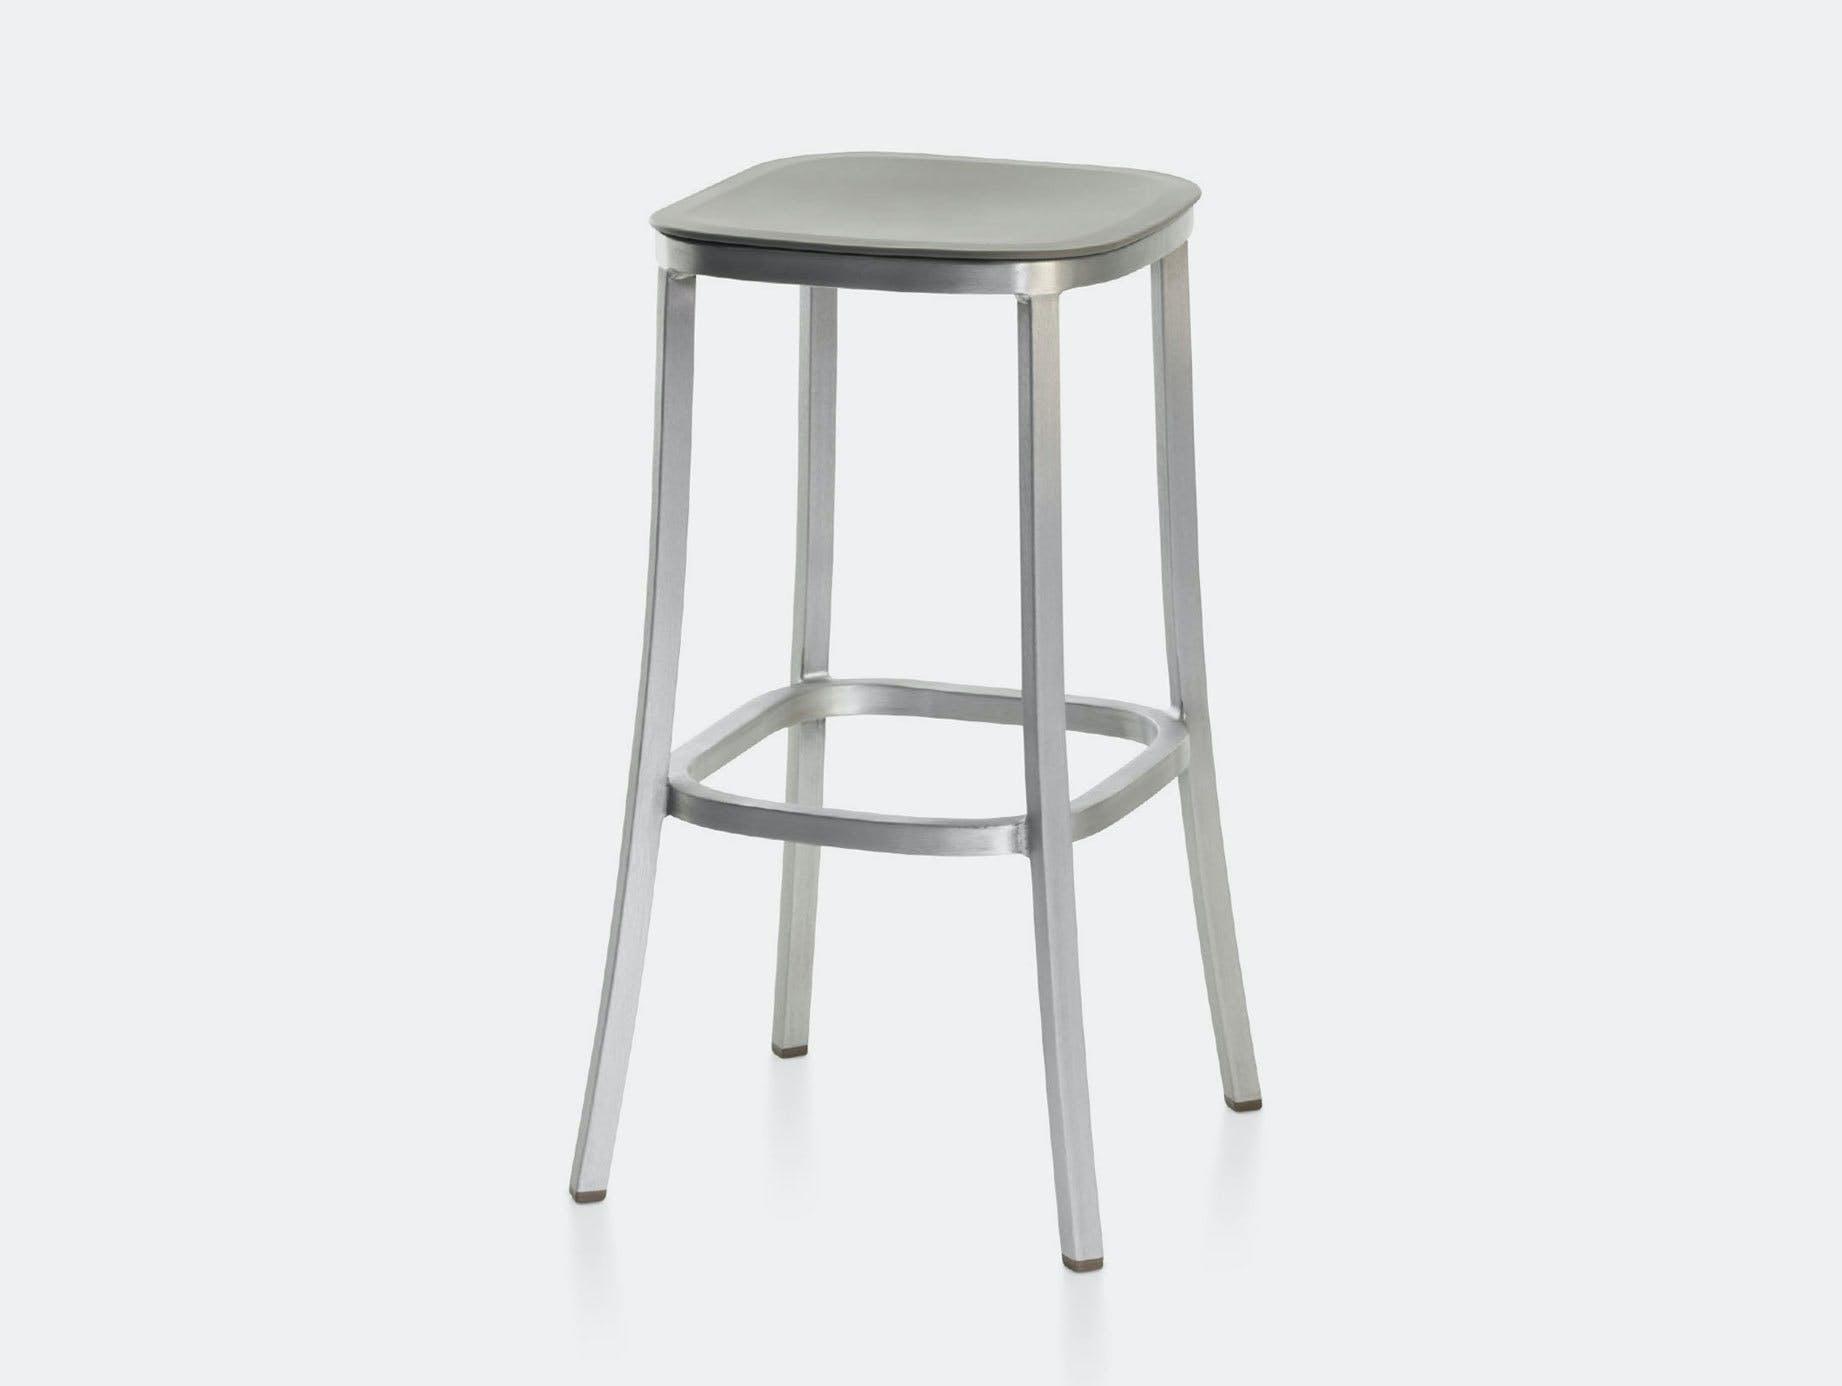 Emeco 1 Inch Barstool Aluminium Light Grey Jasper Morrison